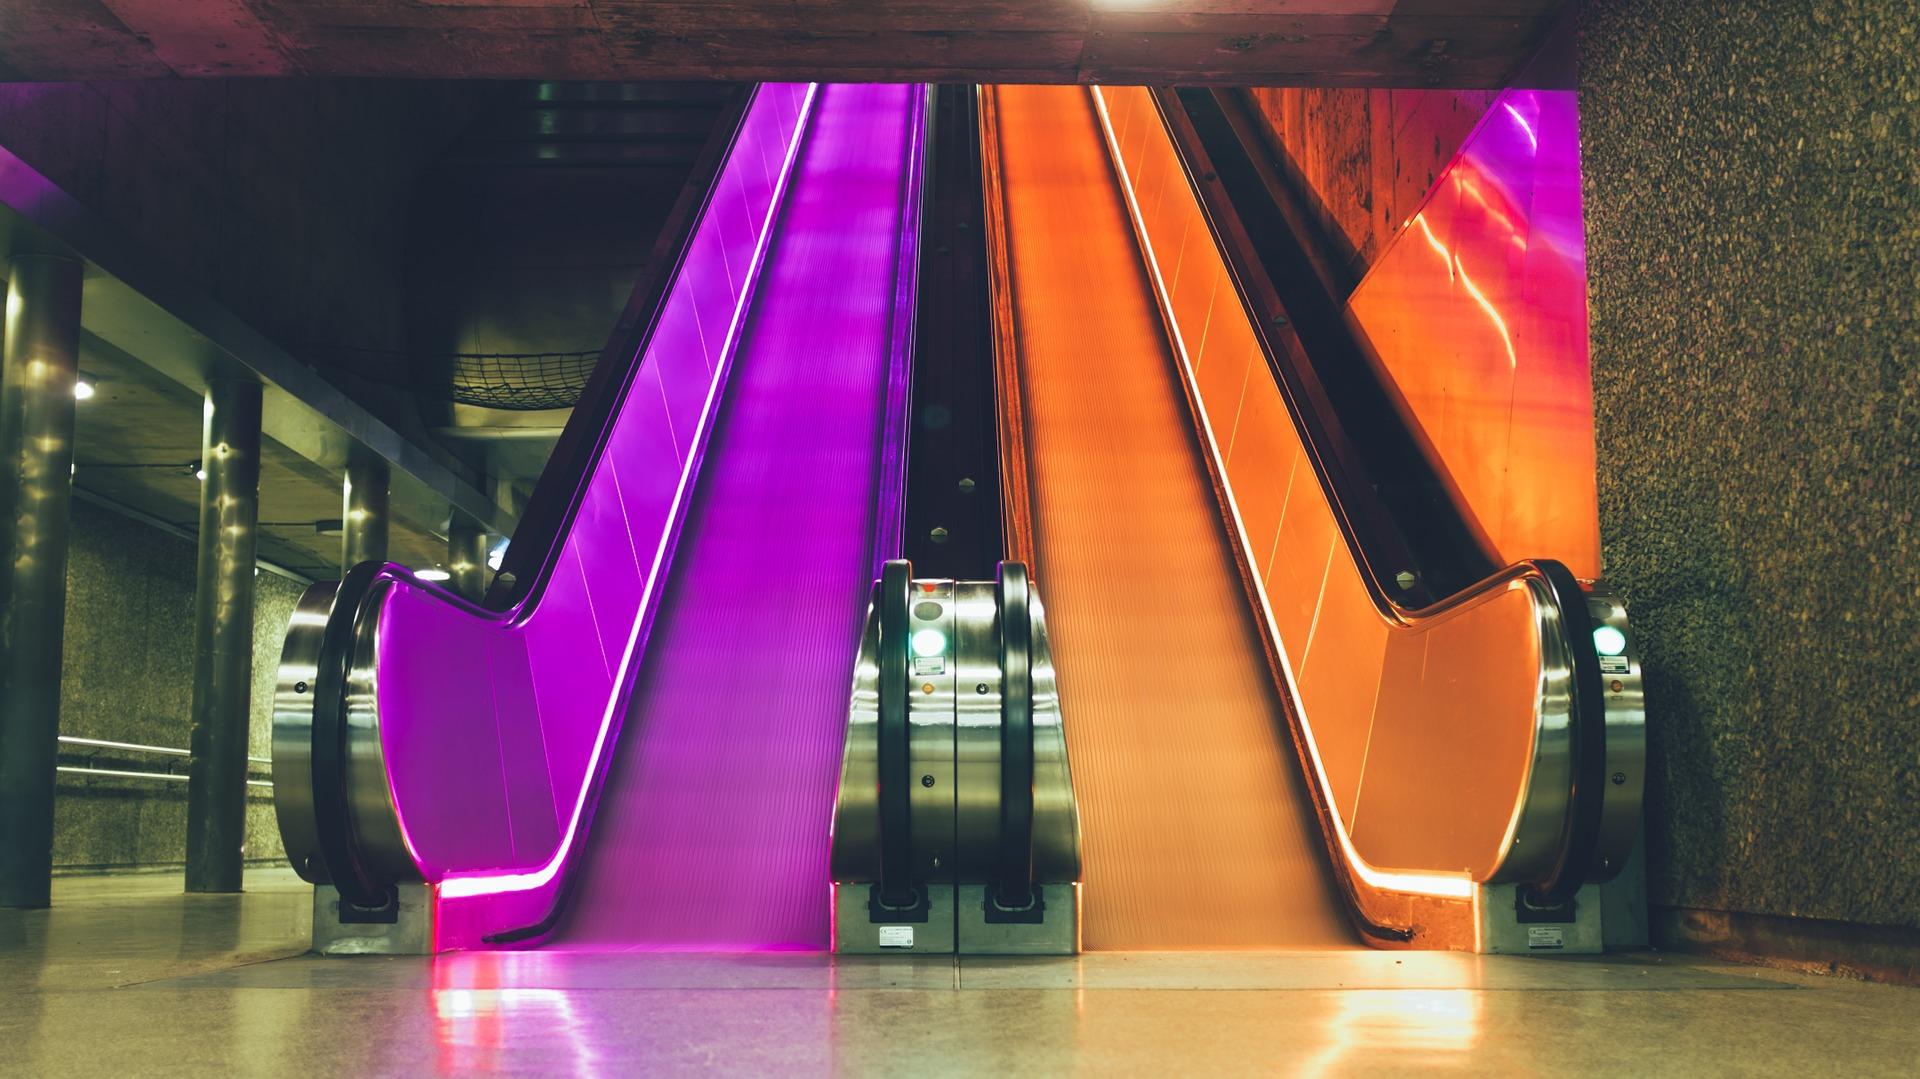 escalator-698488_1920.jpg